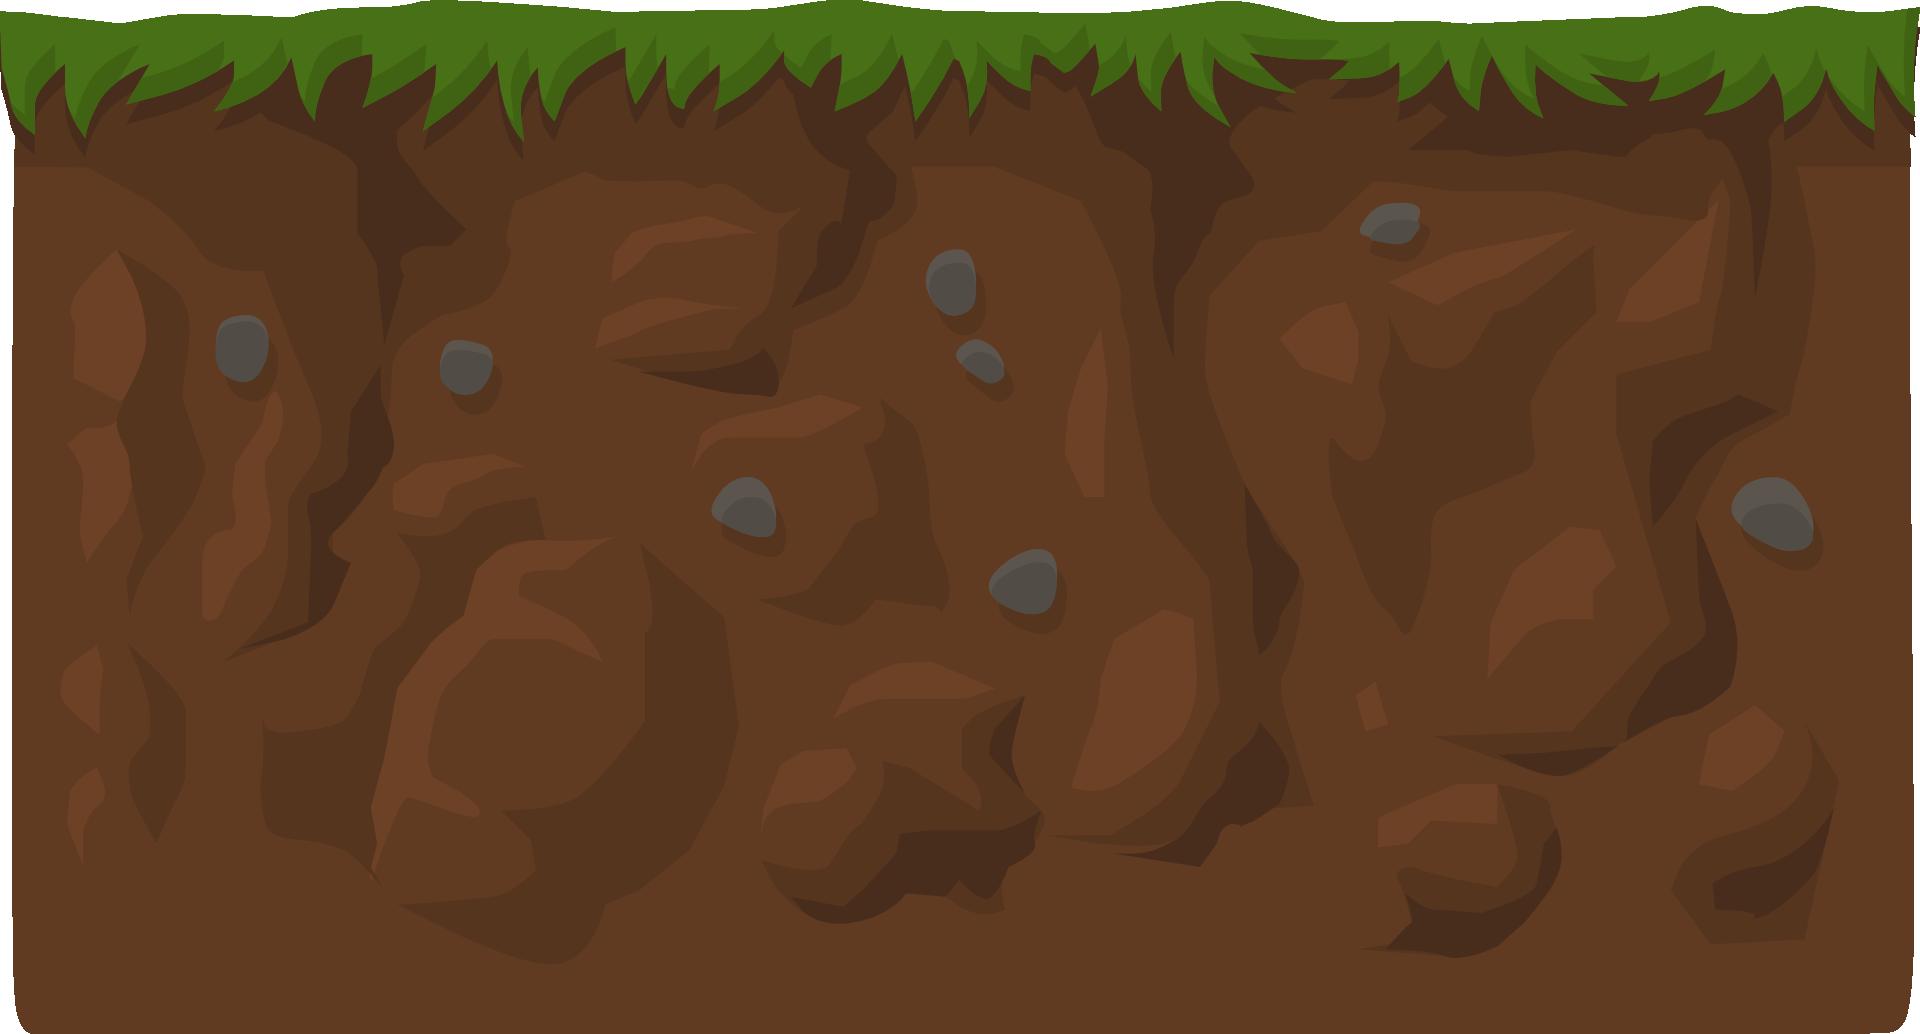 k t qu h nh nh cho soil clipart titanium pinterest rh pinterest com soil clipart gif soil clipart images